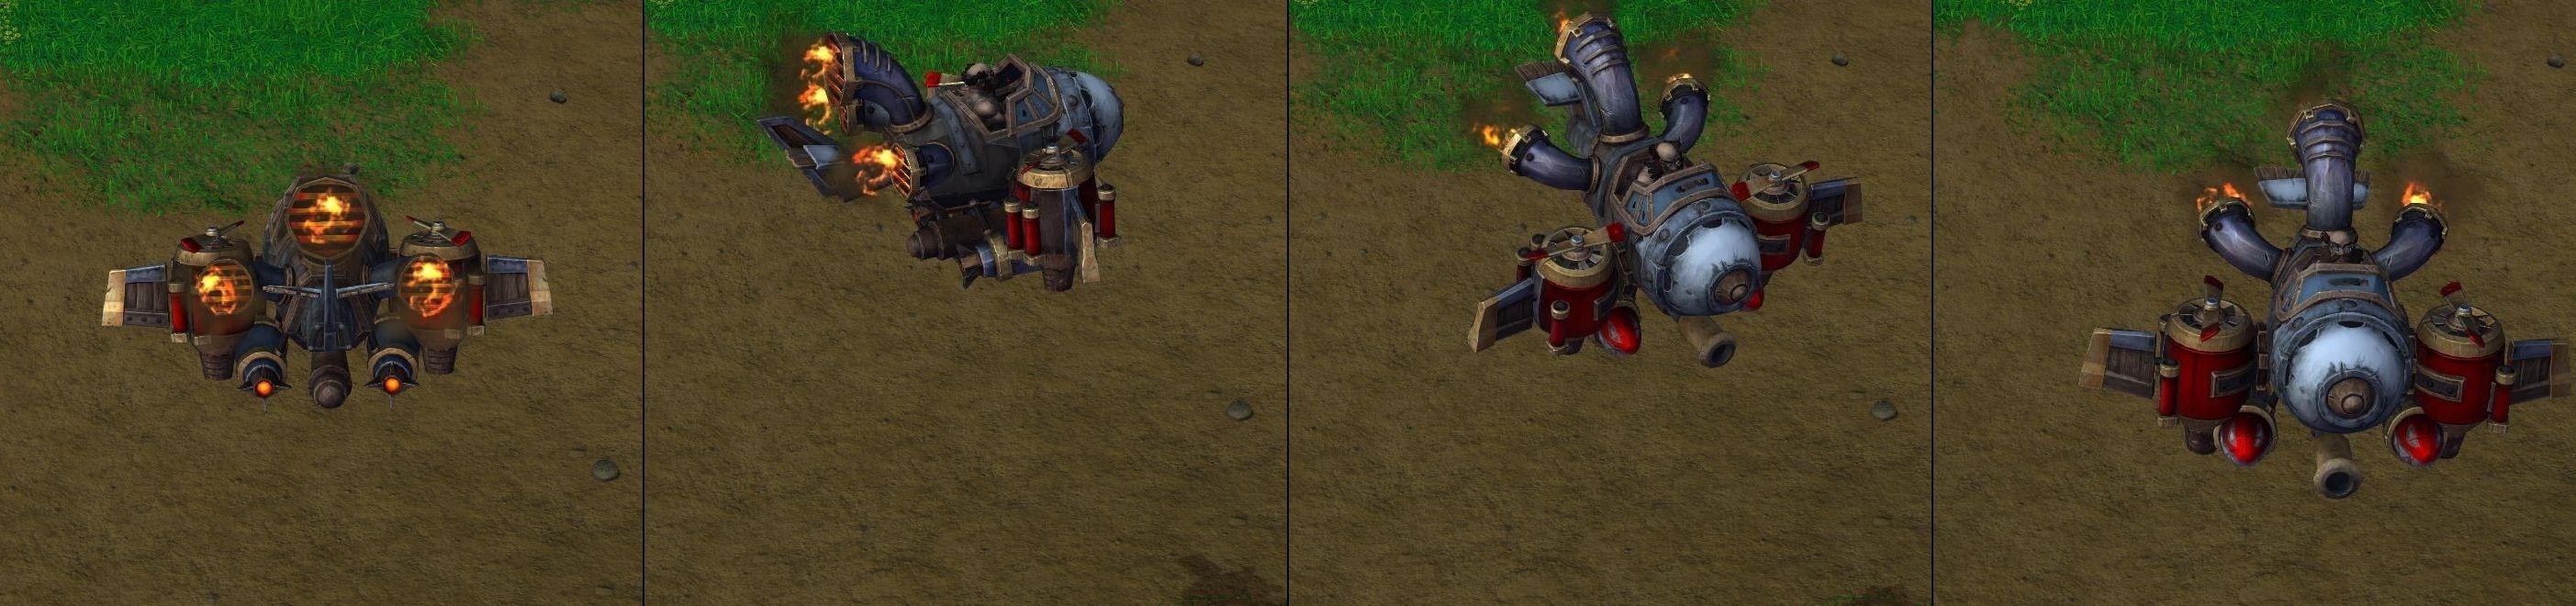 Warcraft 3 Reforged Flying Machine